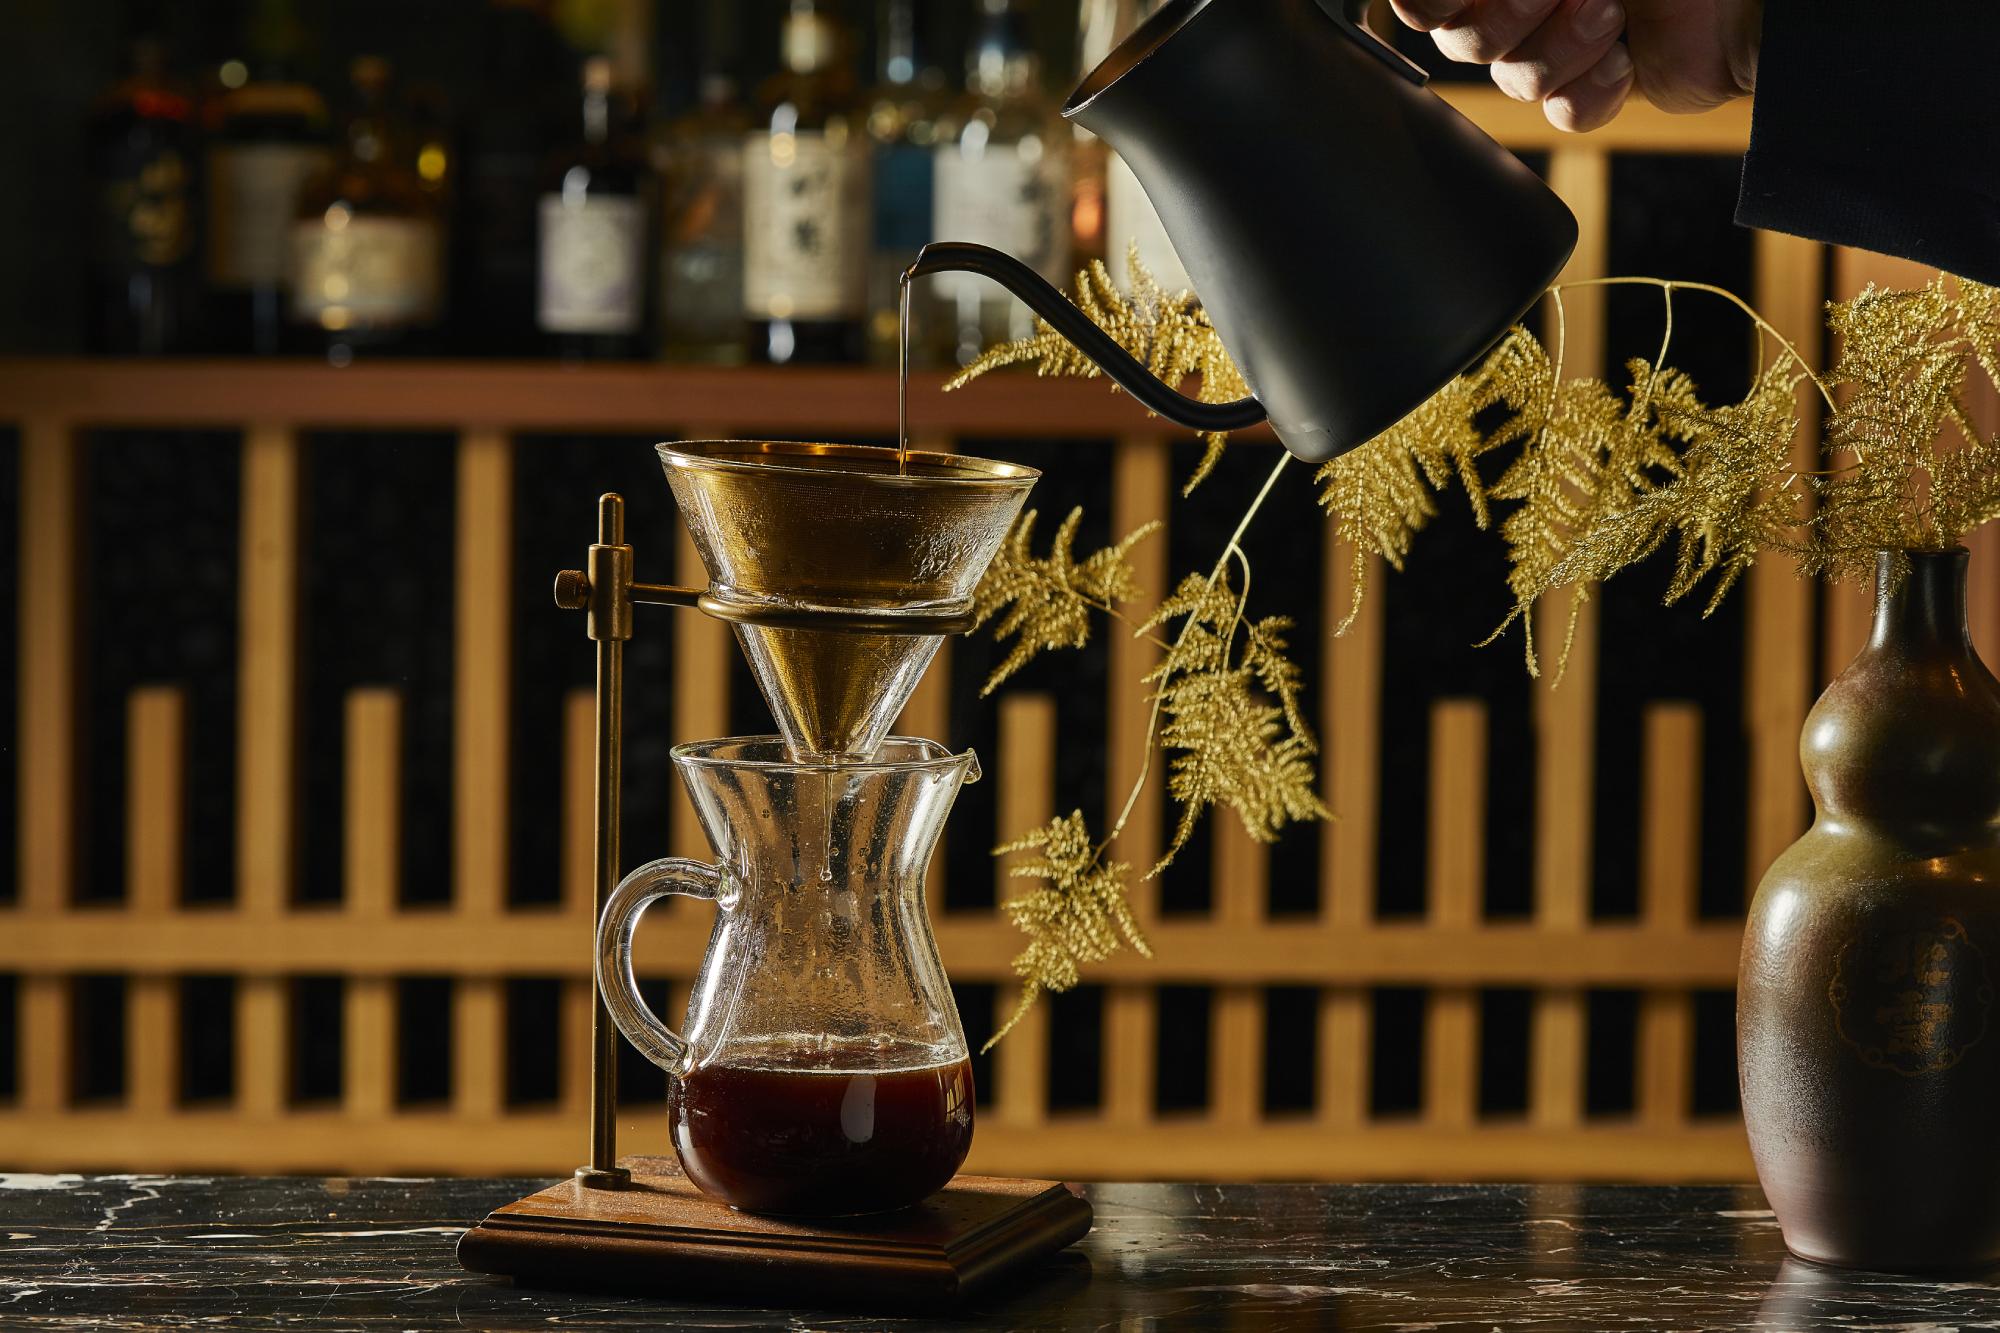 Nobu Cafe Shoreditch Kinto Coffee